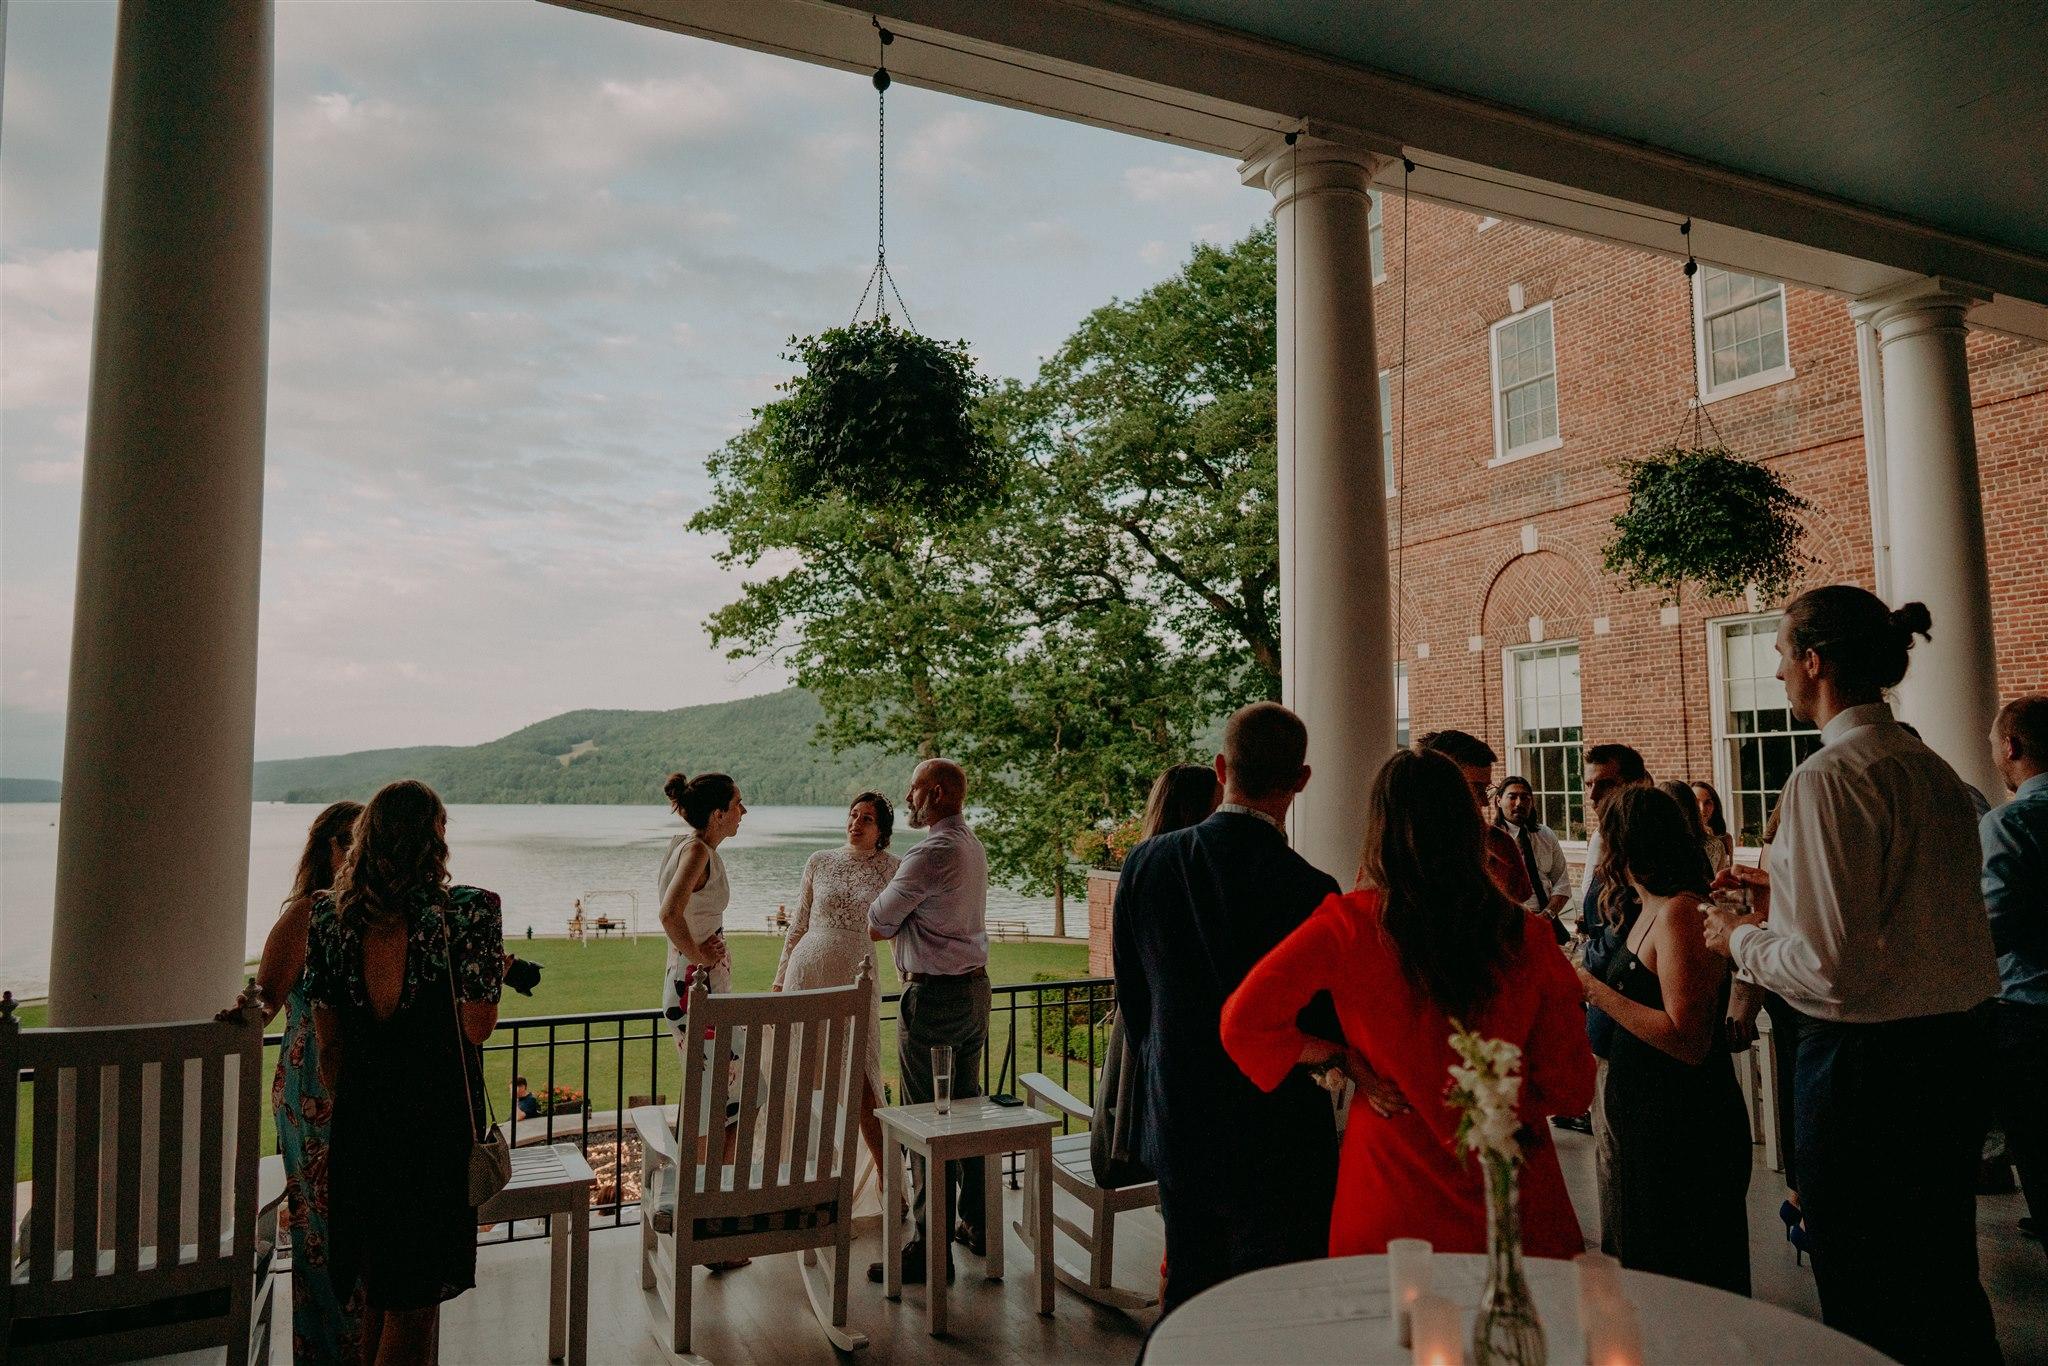 Chellise_Michael_Photography_Hudson_Valley_Wedding_Photographer_Otesaga_Hotel-6081.jpg